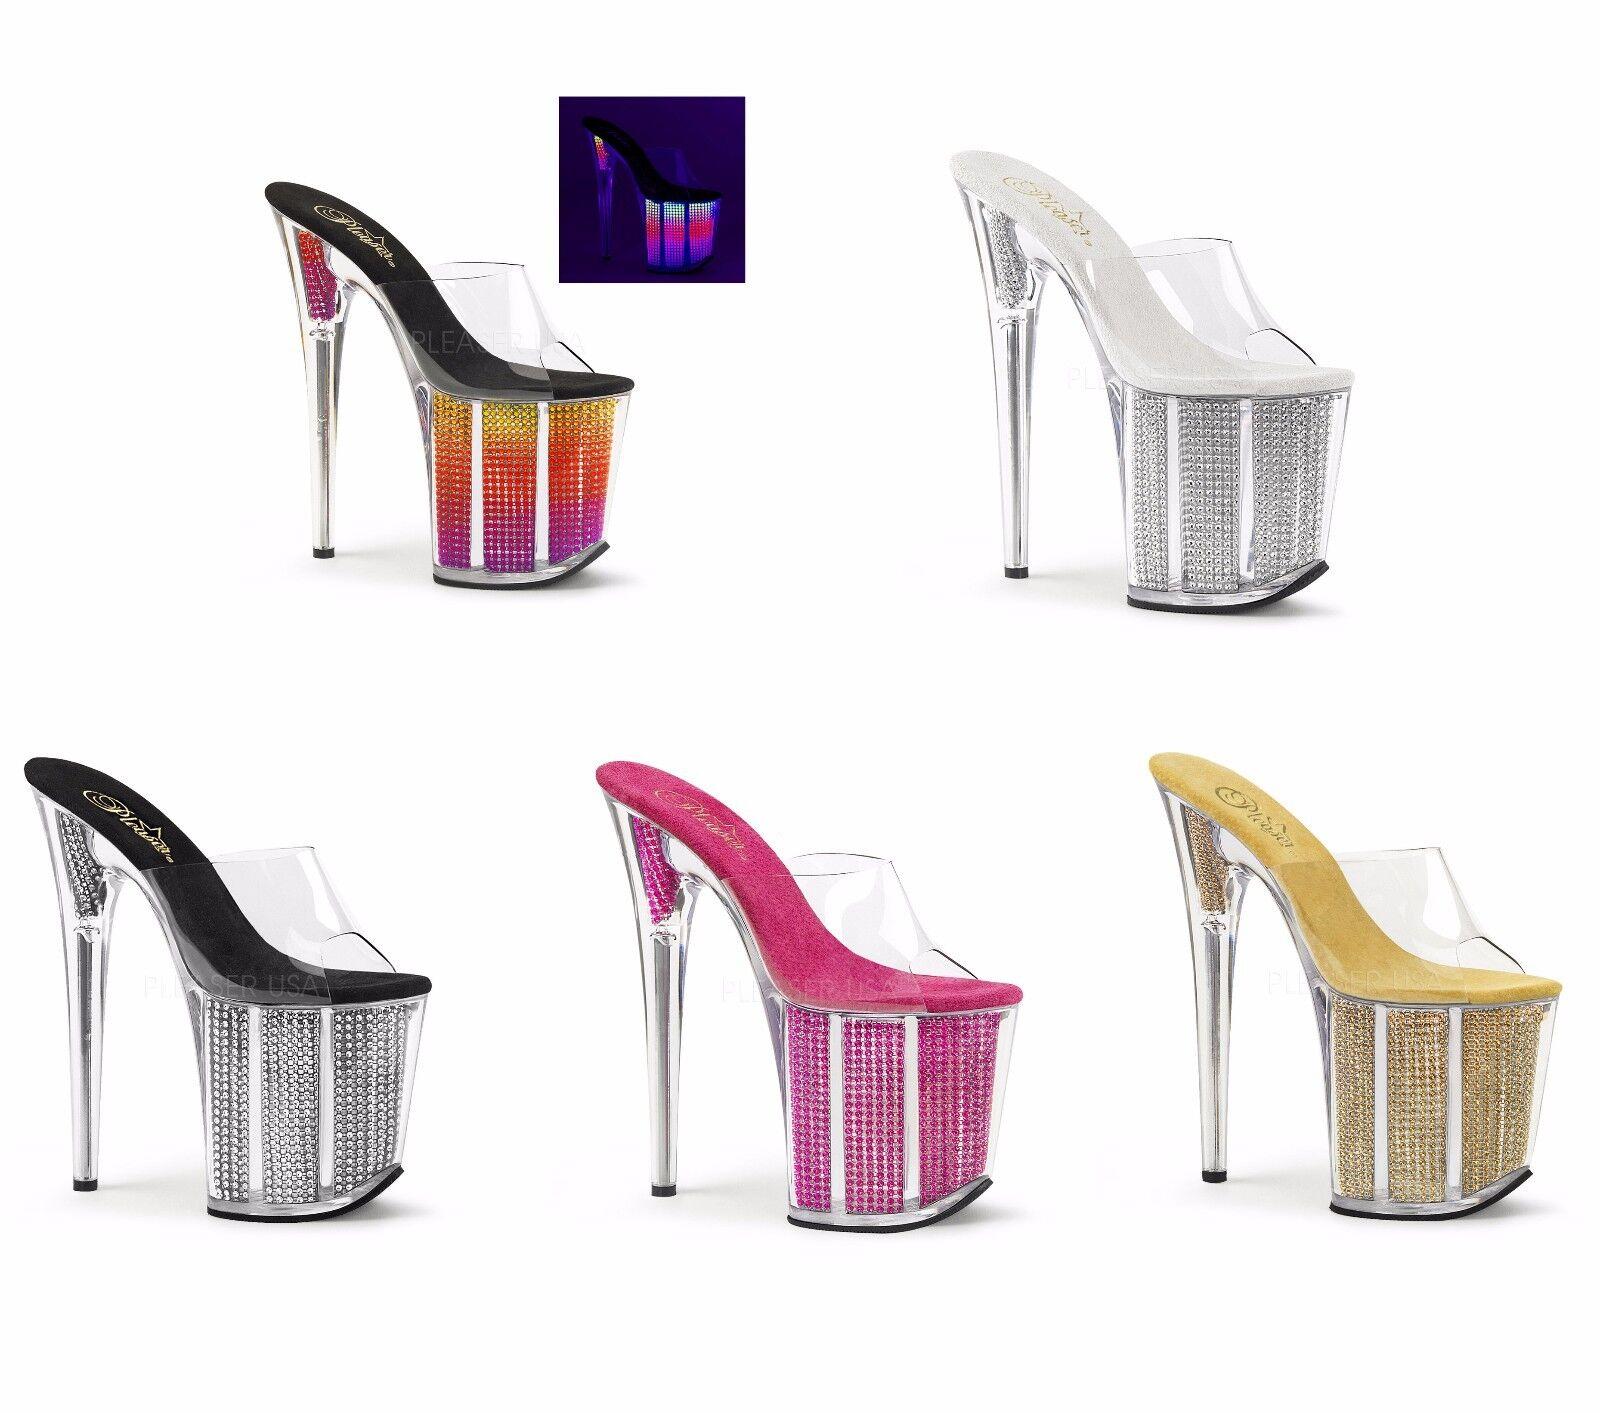 Pleaser Flamingo - 801SRS diapositiva diapositiva diapositiva de plataforma de baile exótico  entrega rápida